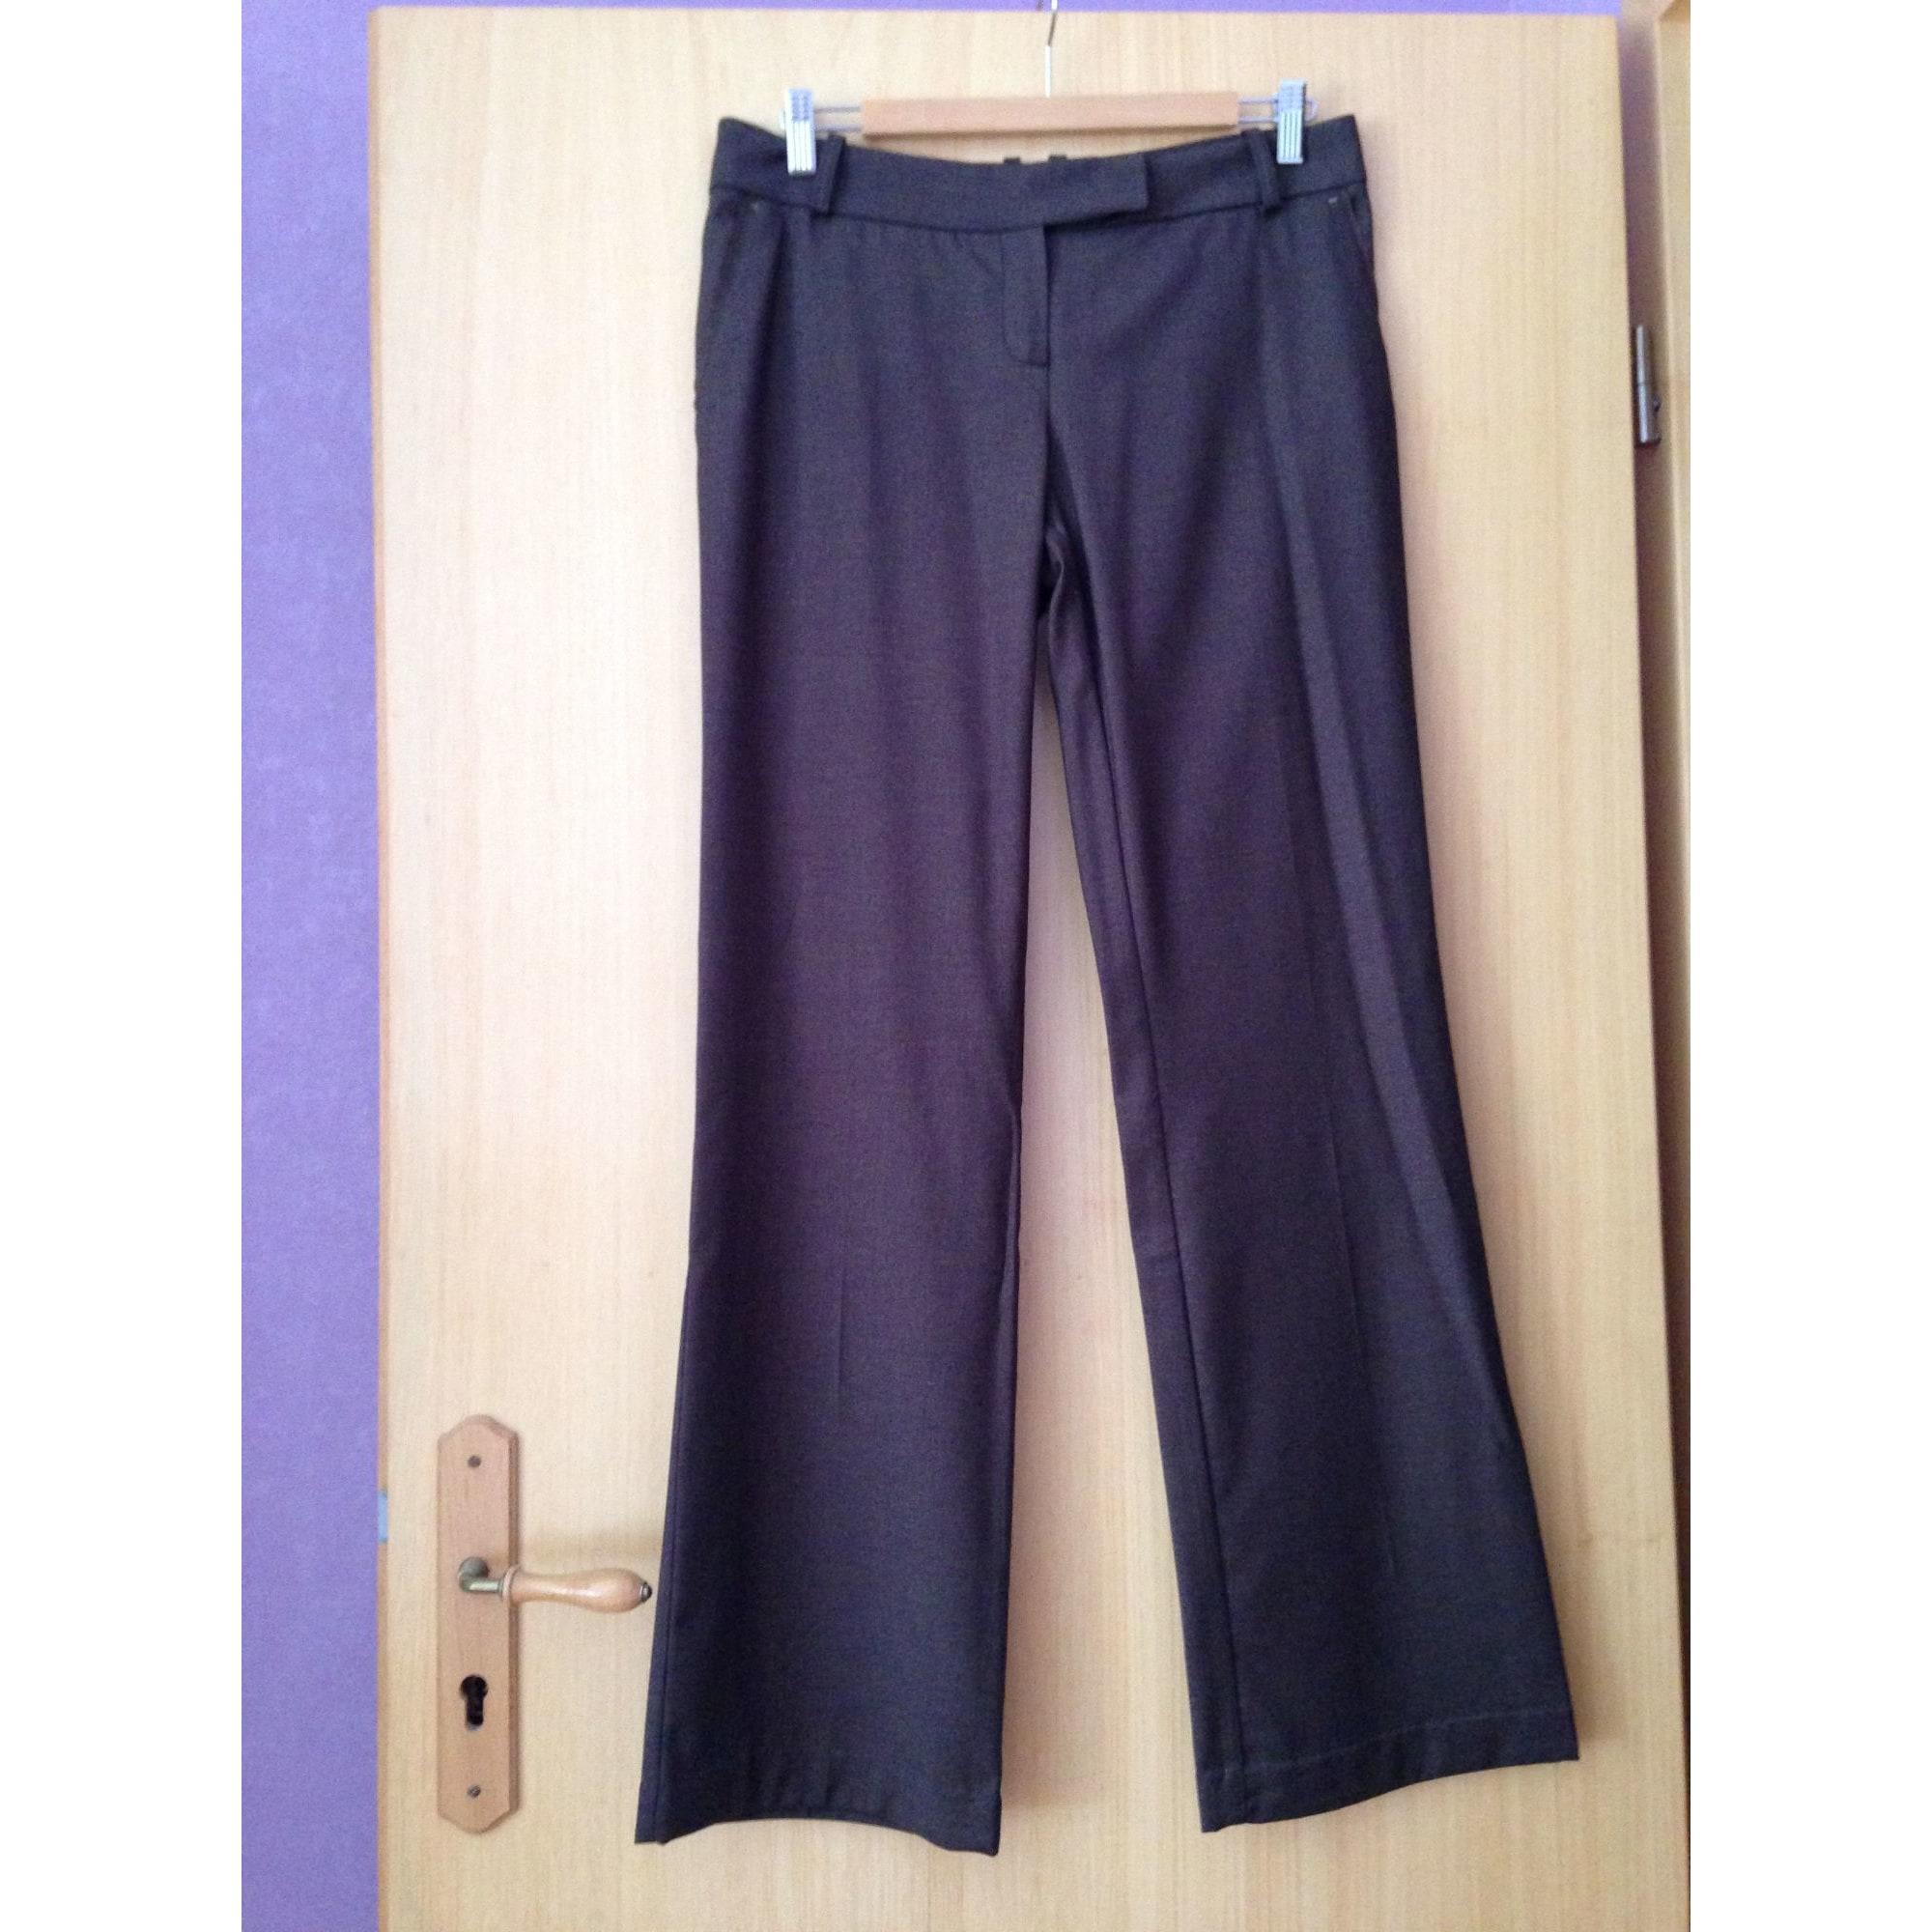 Tailleur pantalon SINÉQUANONE Marron